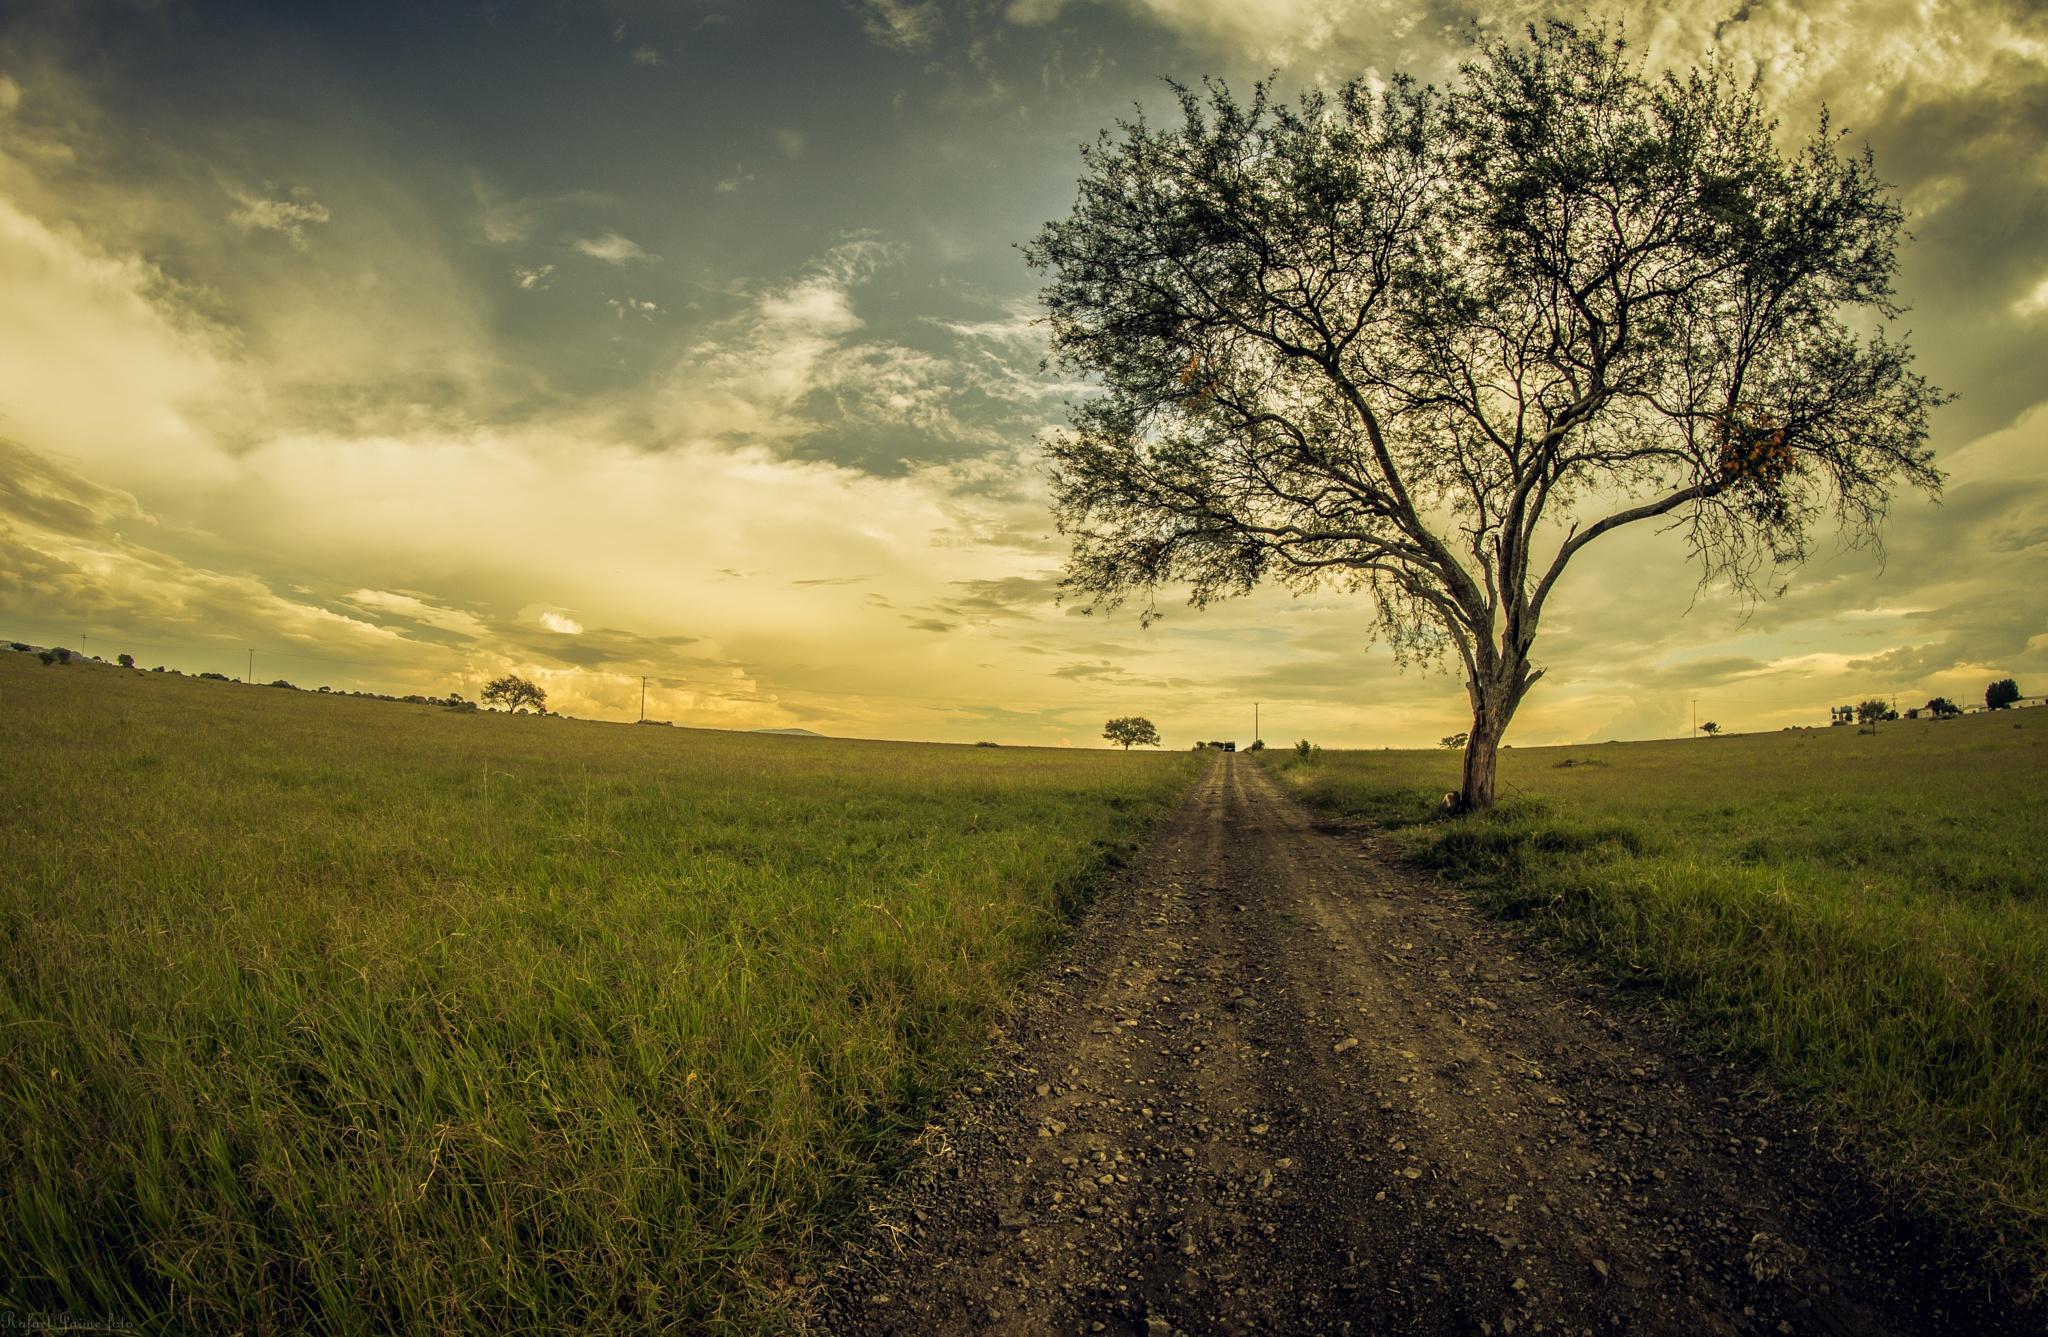 Camino aventura by Rafael Jaime